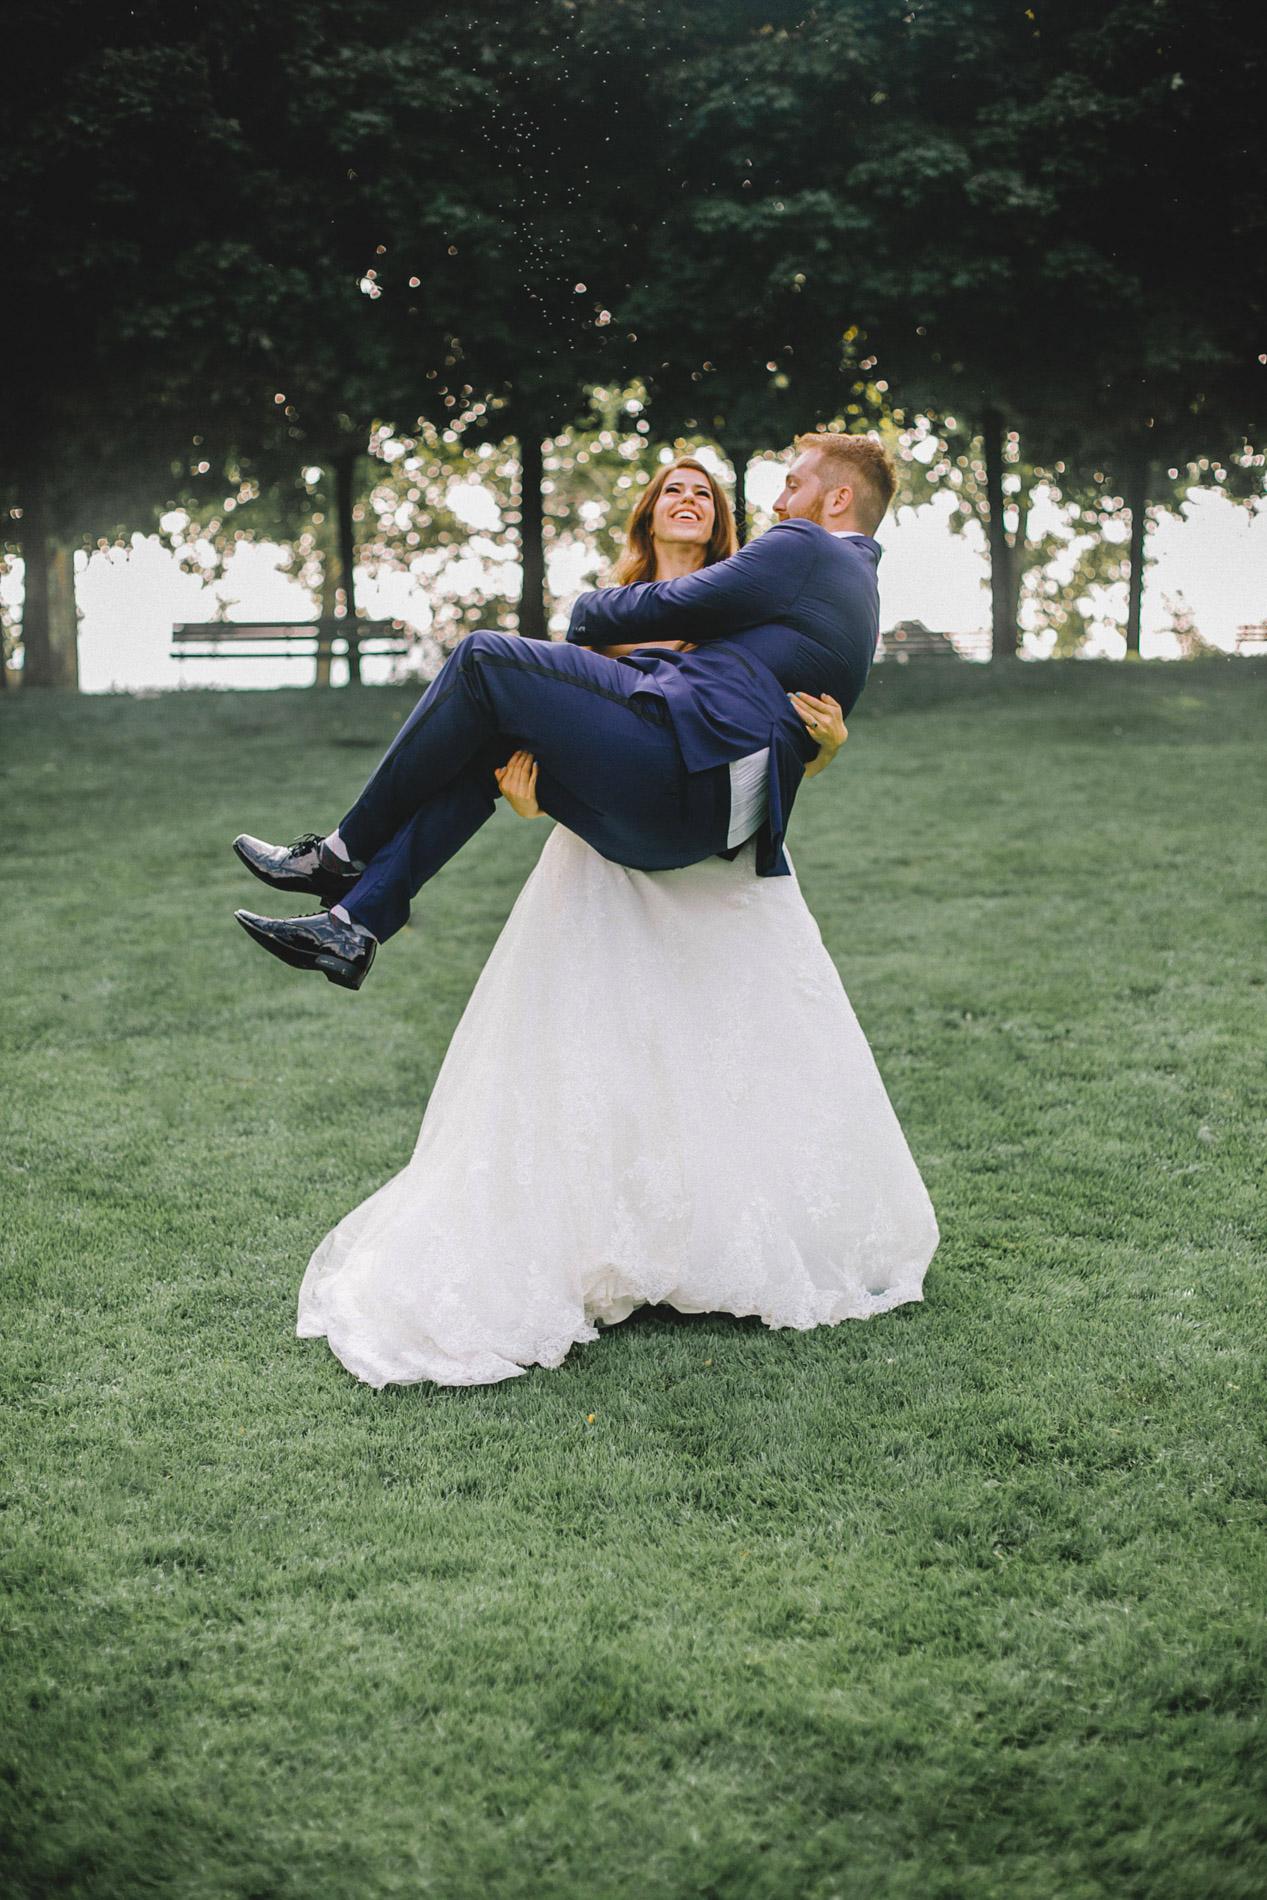 hochzeitsfotografie-schweiz_wedding-photographer-switzerland-europe_Bendik-Photography-071